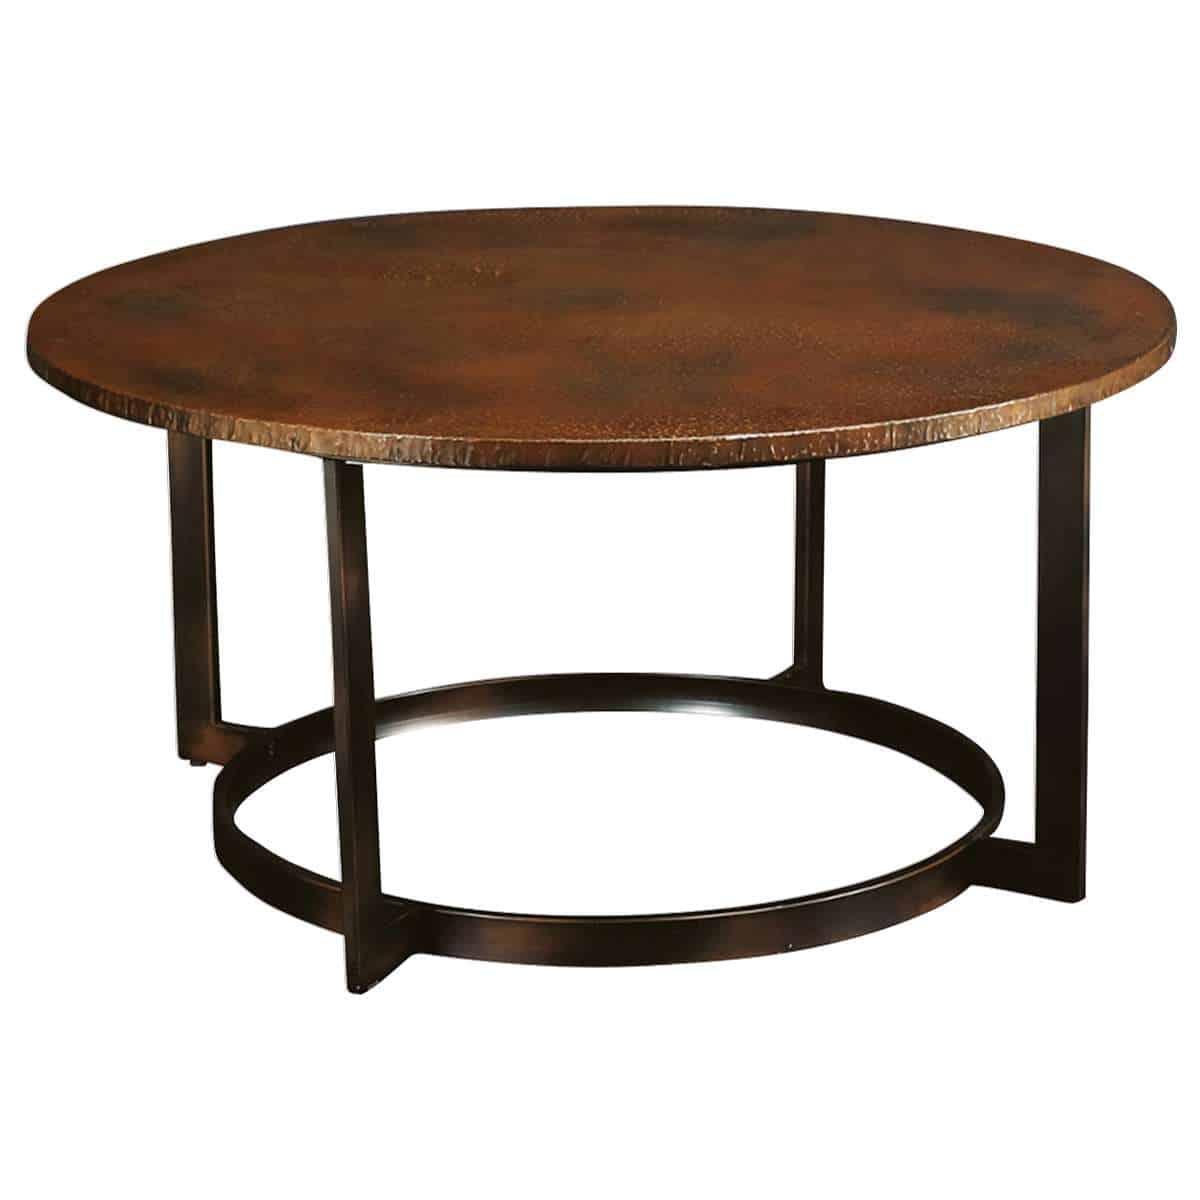 Nueva Round Coffee Table by Hammary